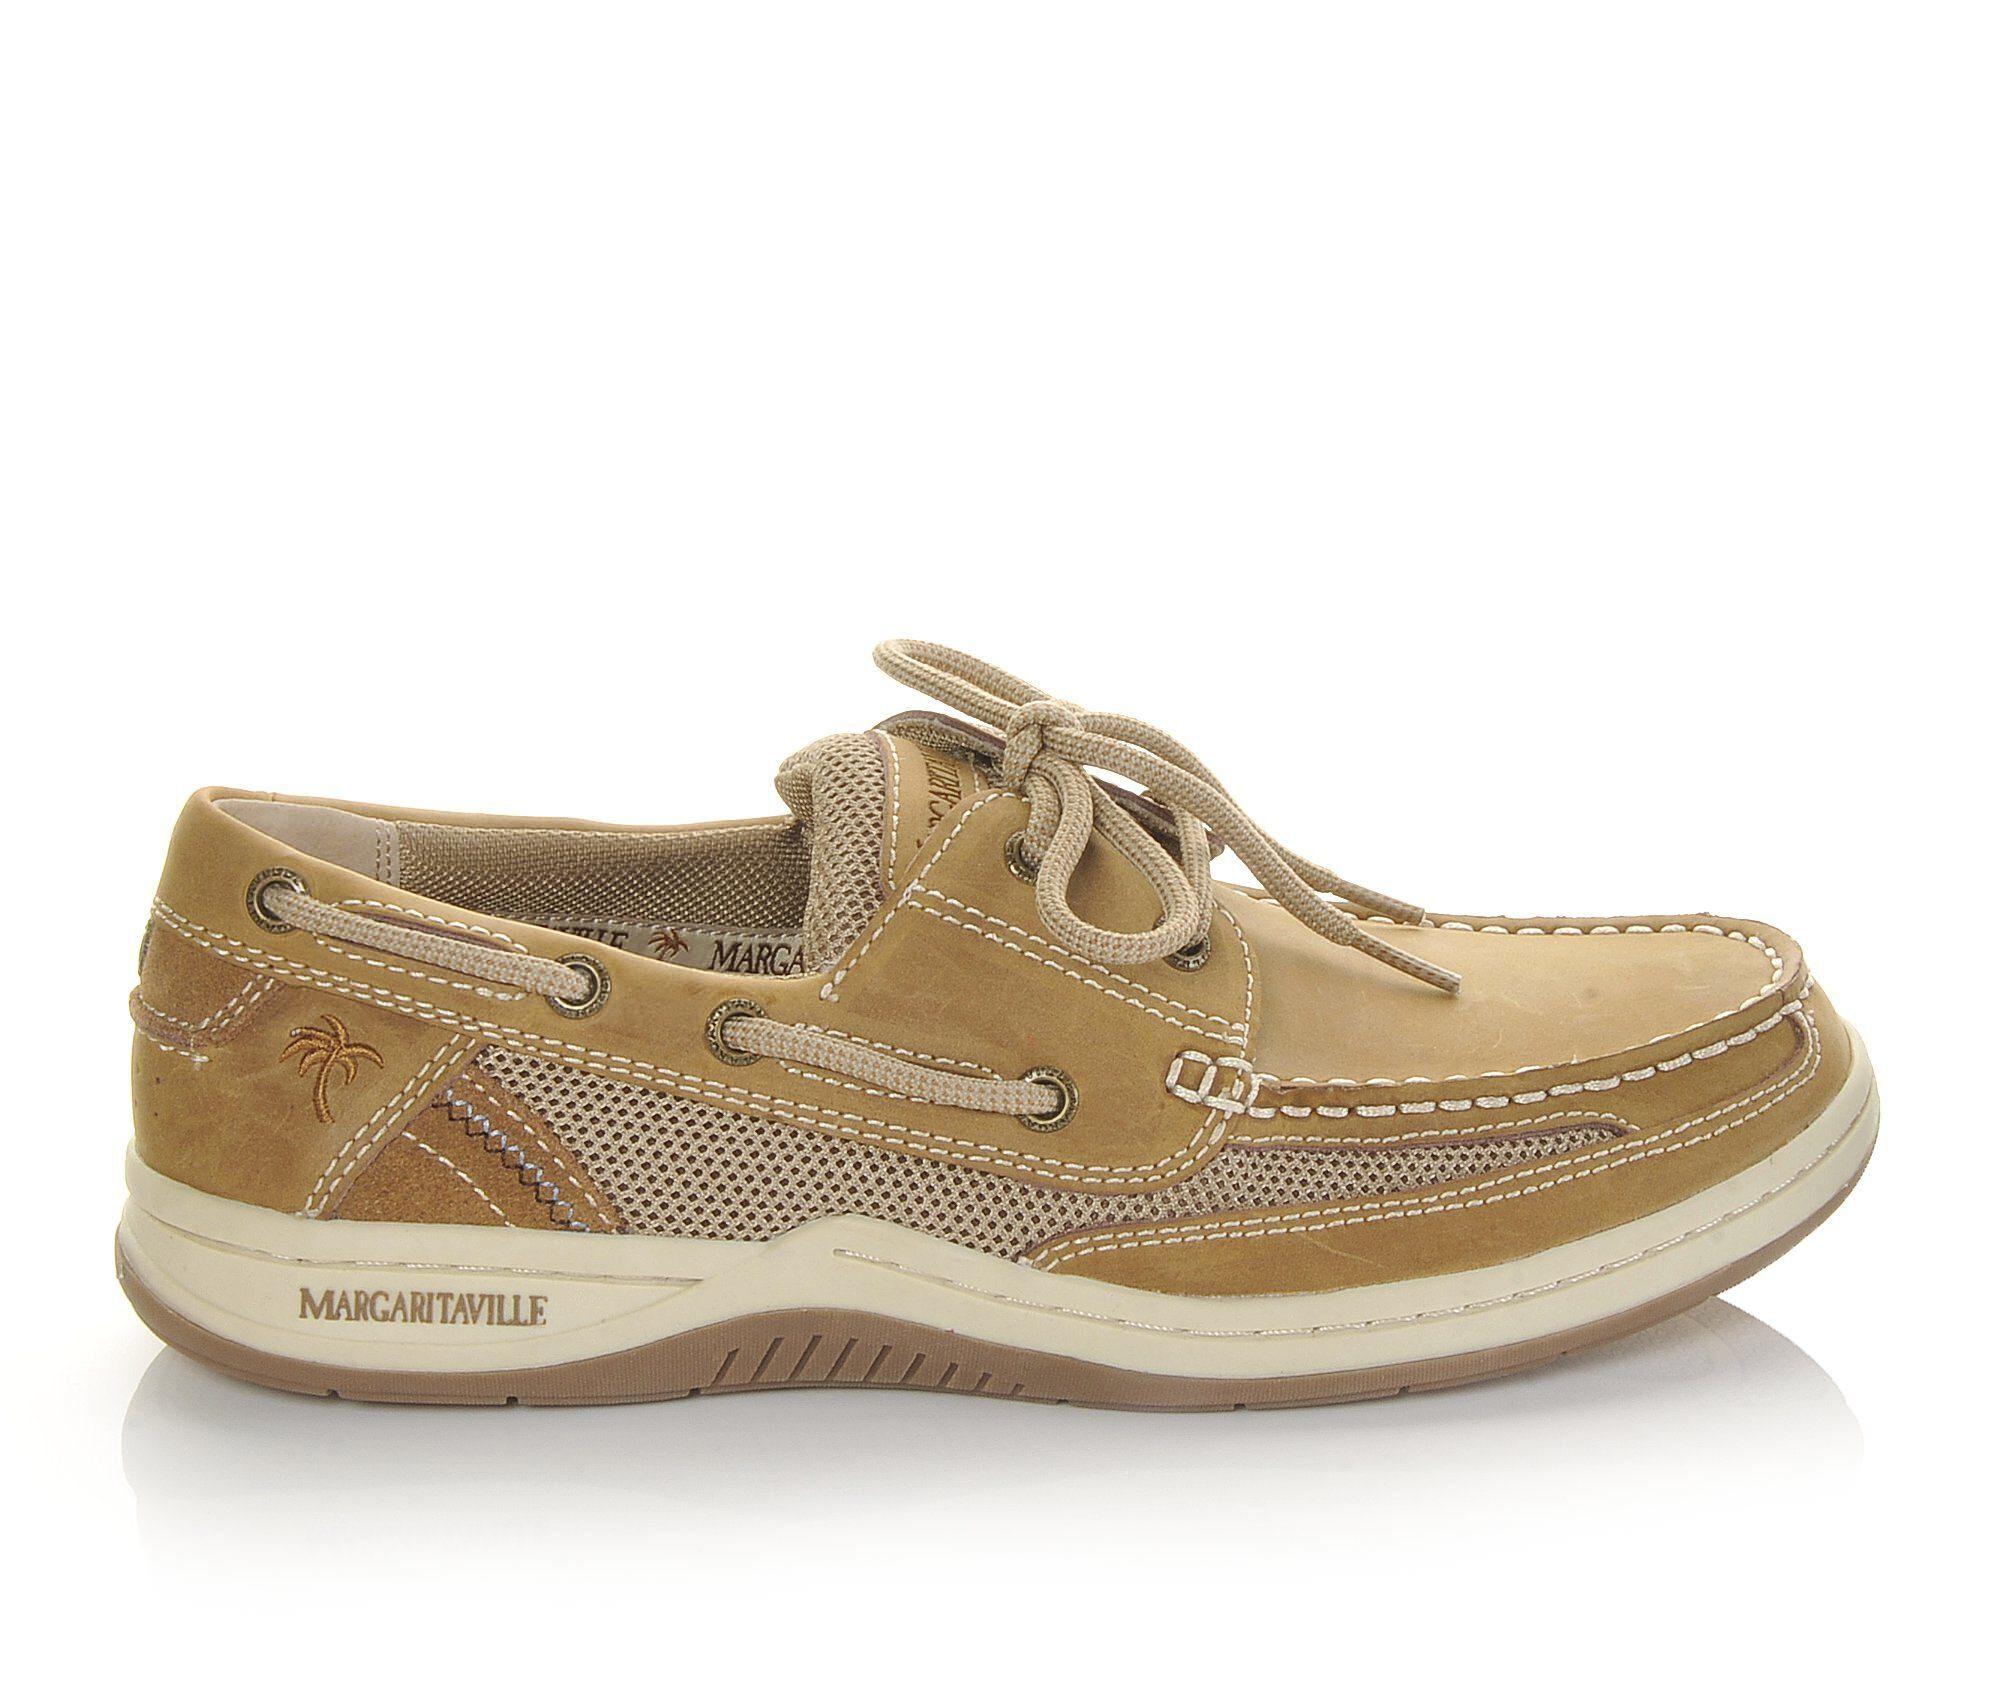 uk shoes_kd2388